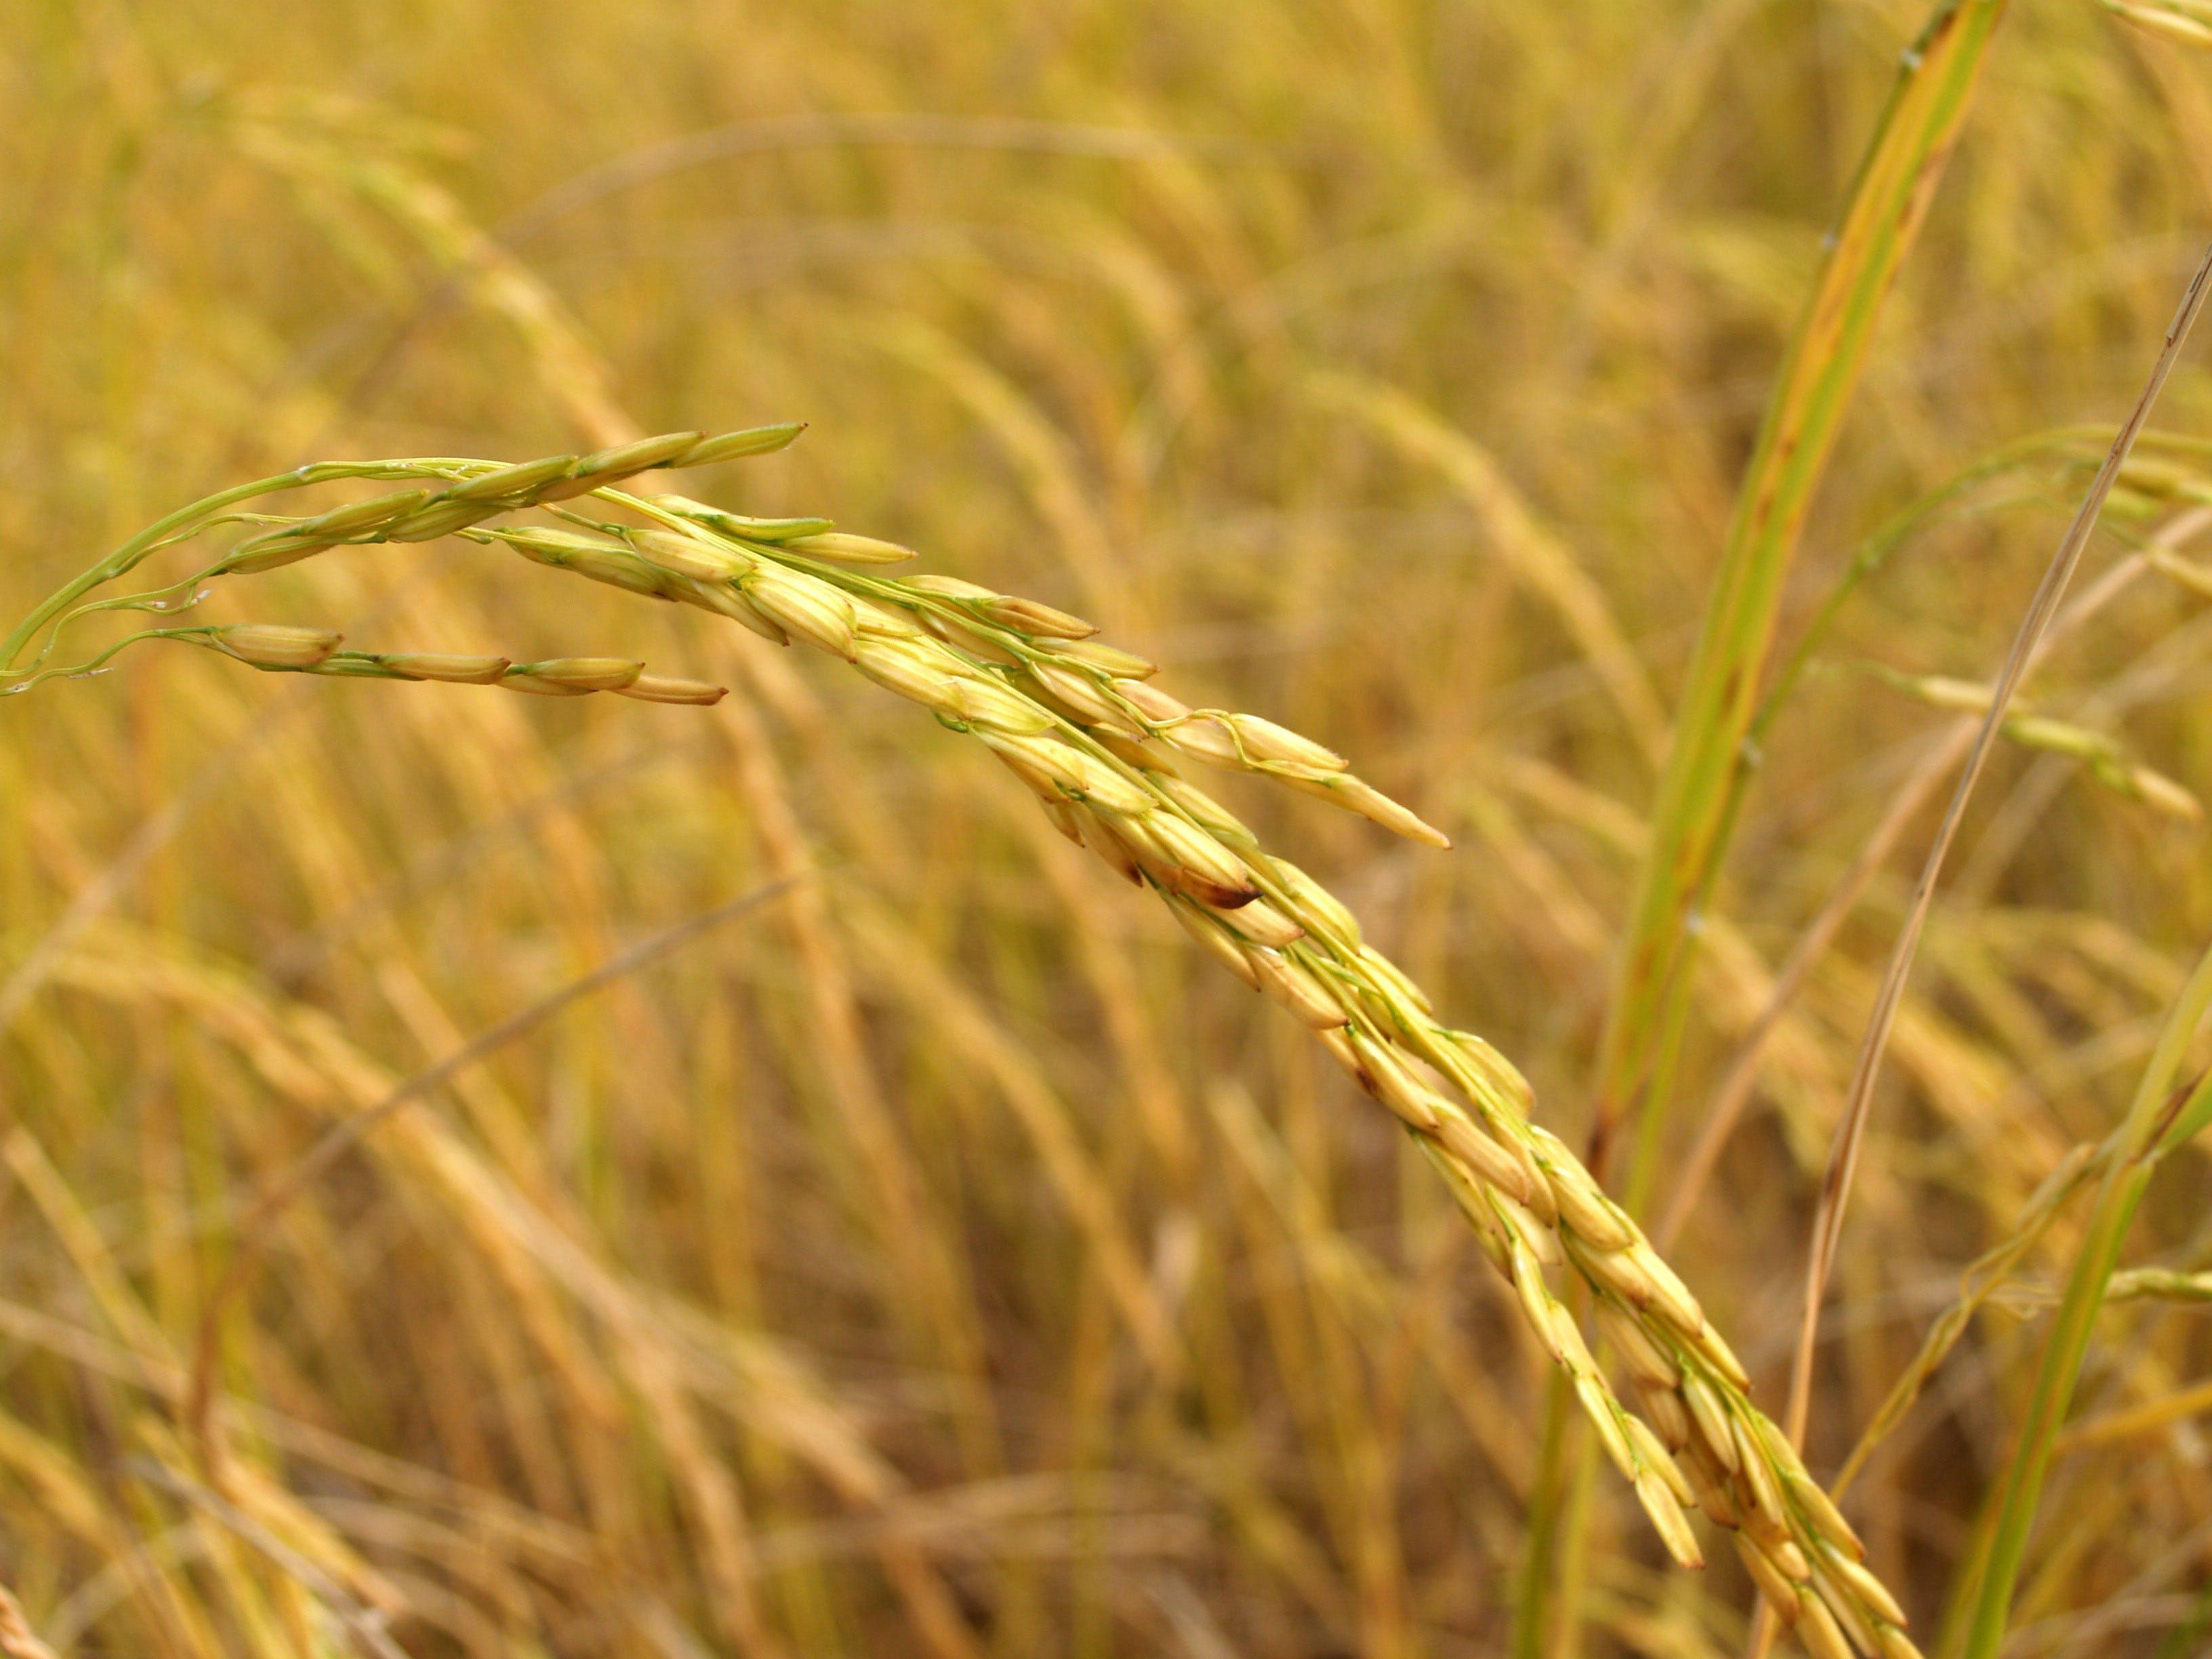 Безкоштовне стокове фото на тему «їжа, Азія, економіка, жито»